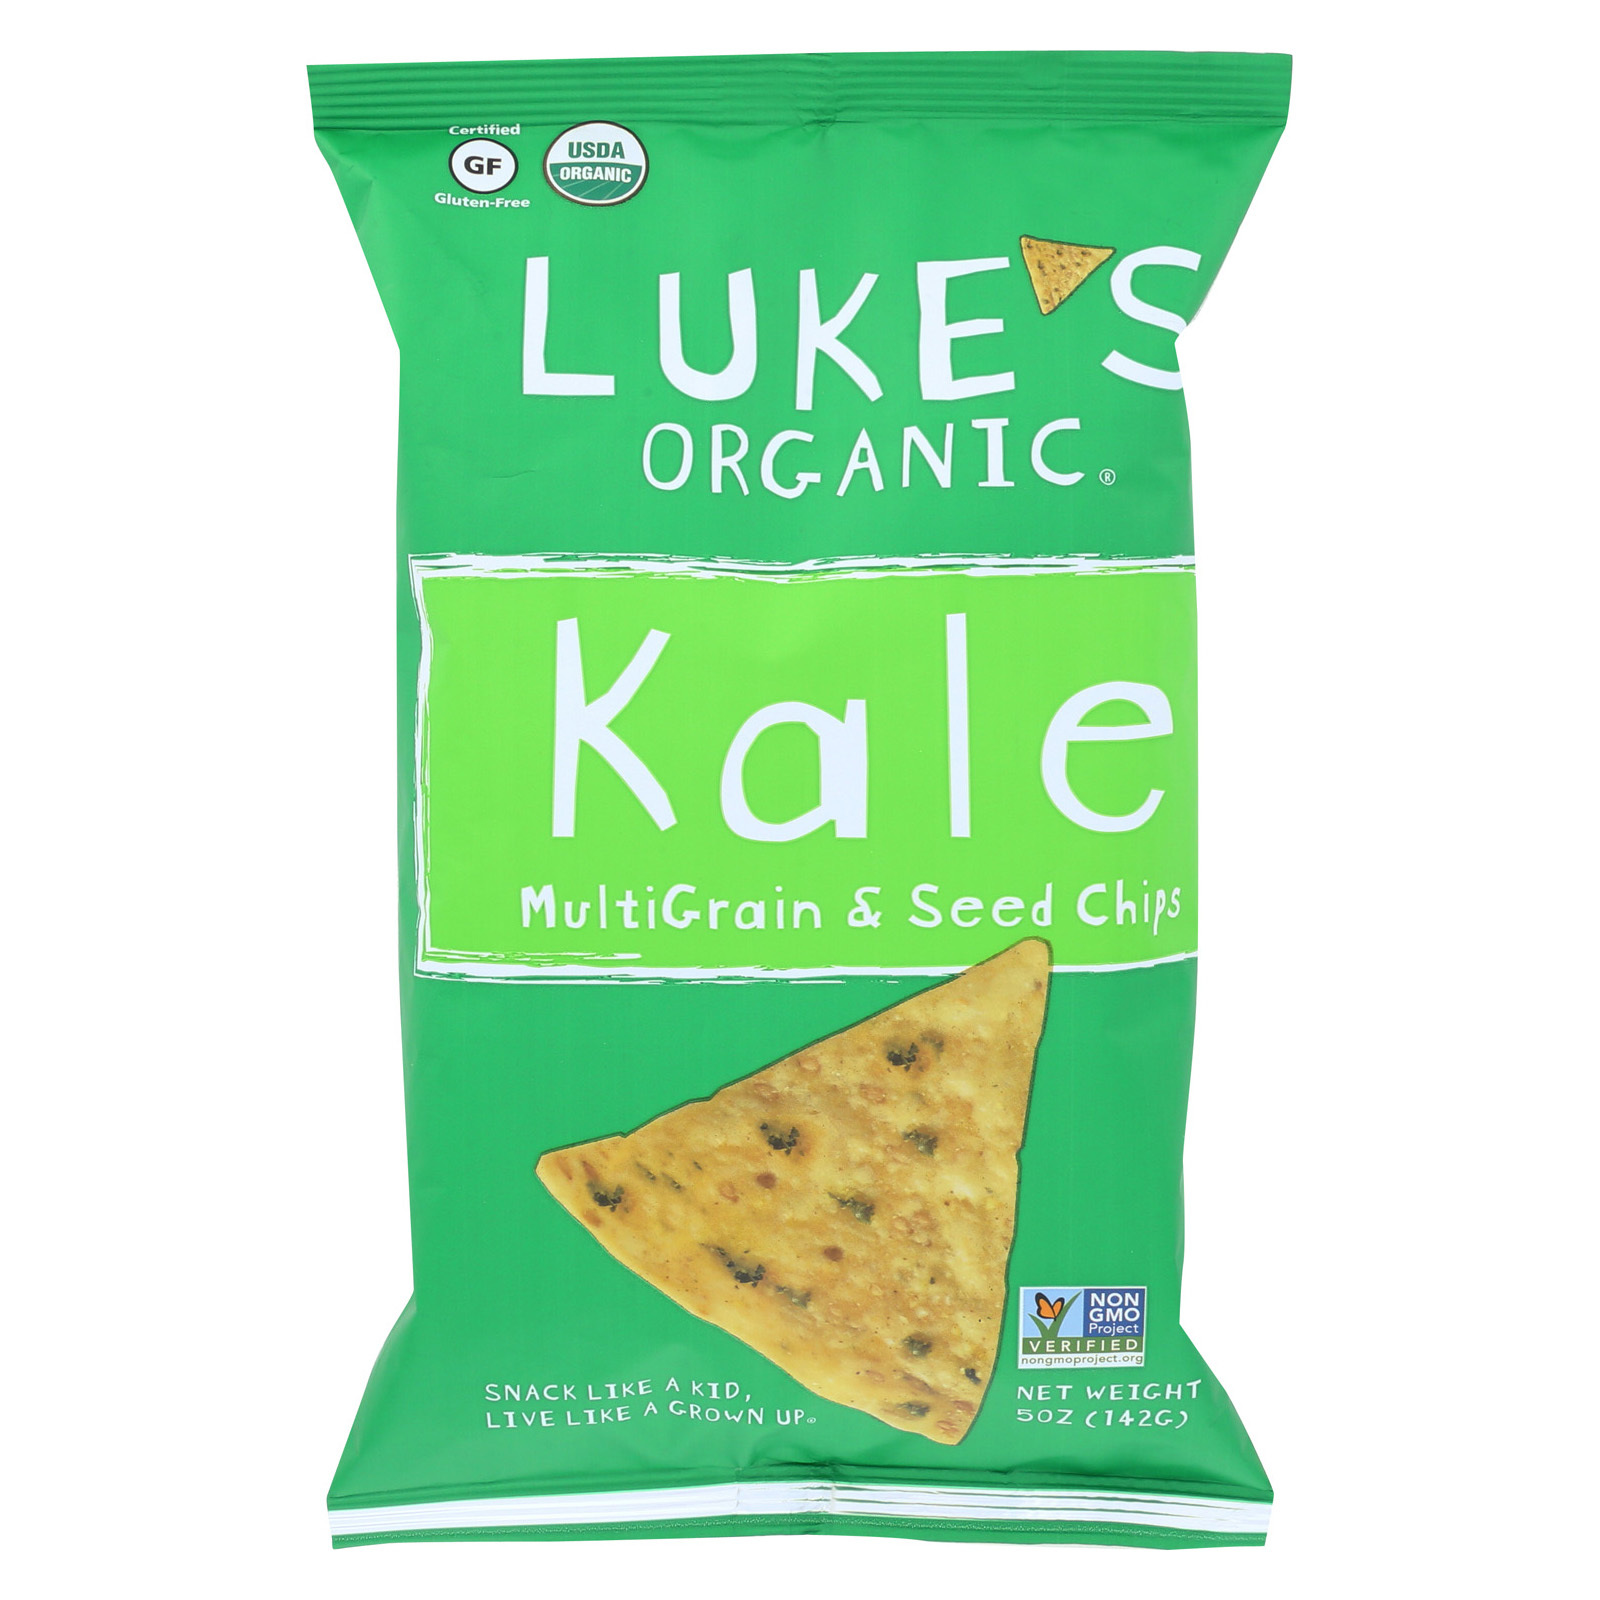 Luke's Organic Kale - Case of 12 - 5 oz.